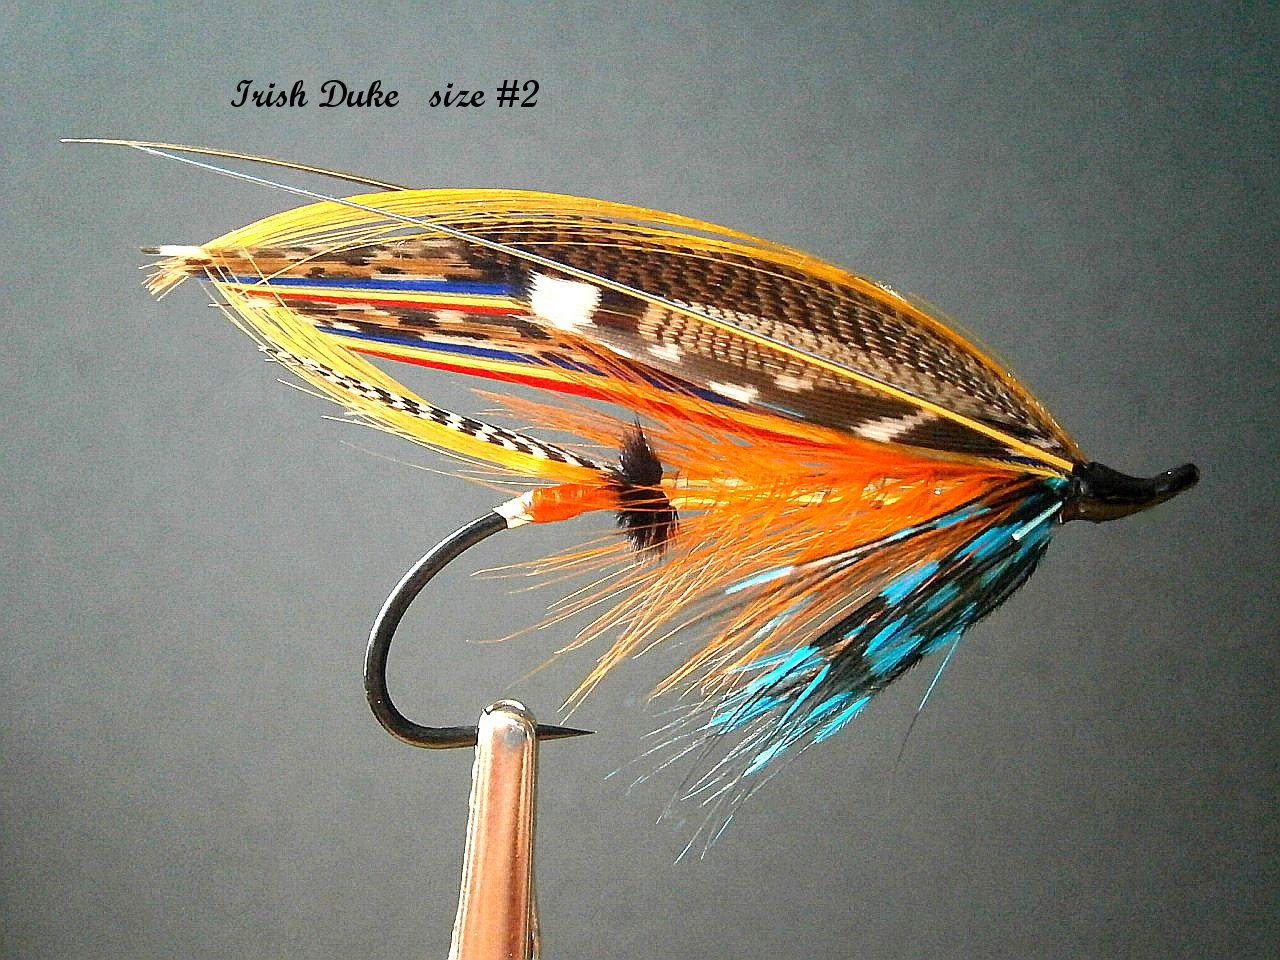 Irish Duke | Fly fishing flies pattern, Salmon flies ... Classic Atlantic Salmon Fly Patterns